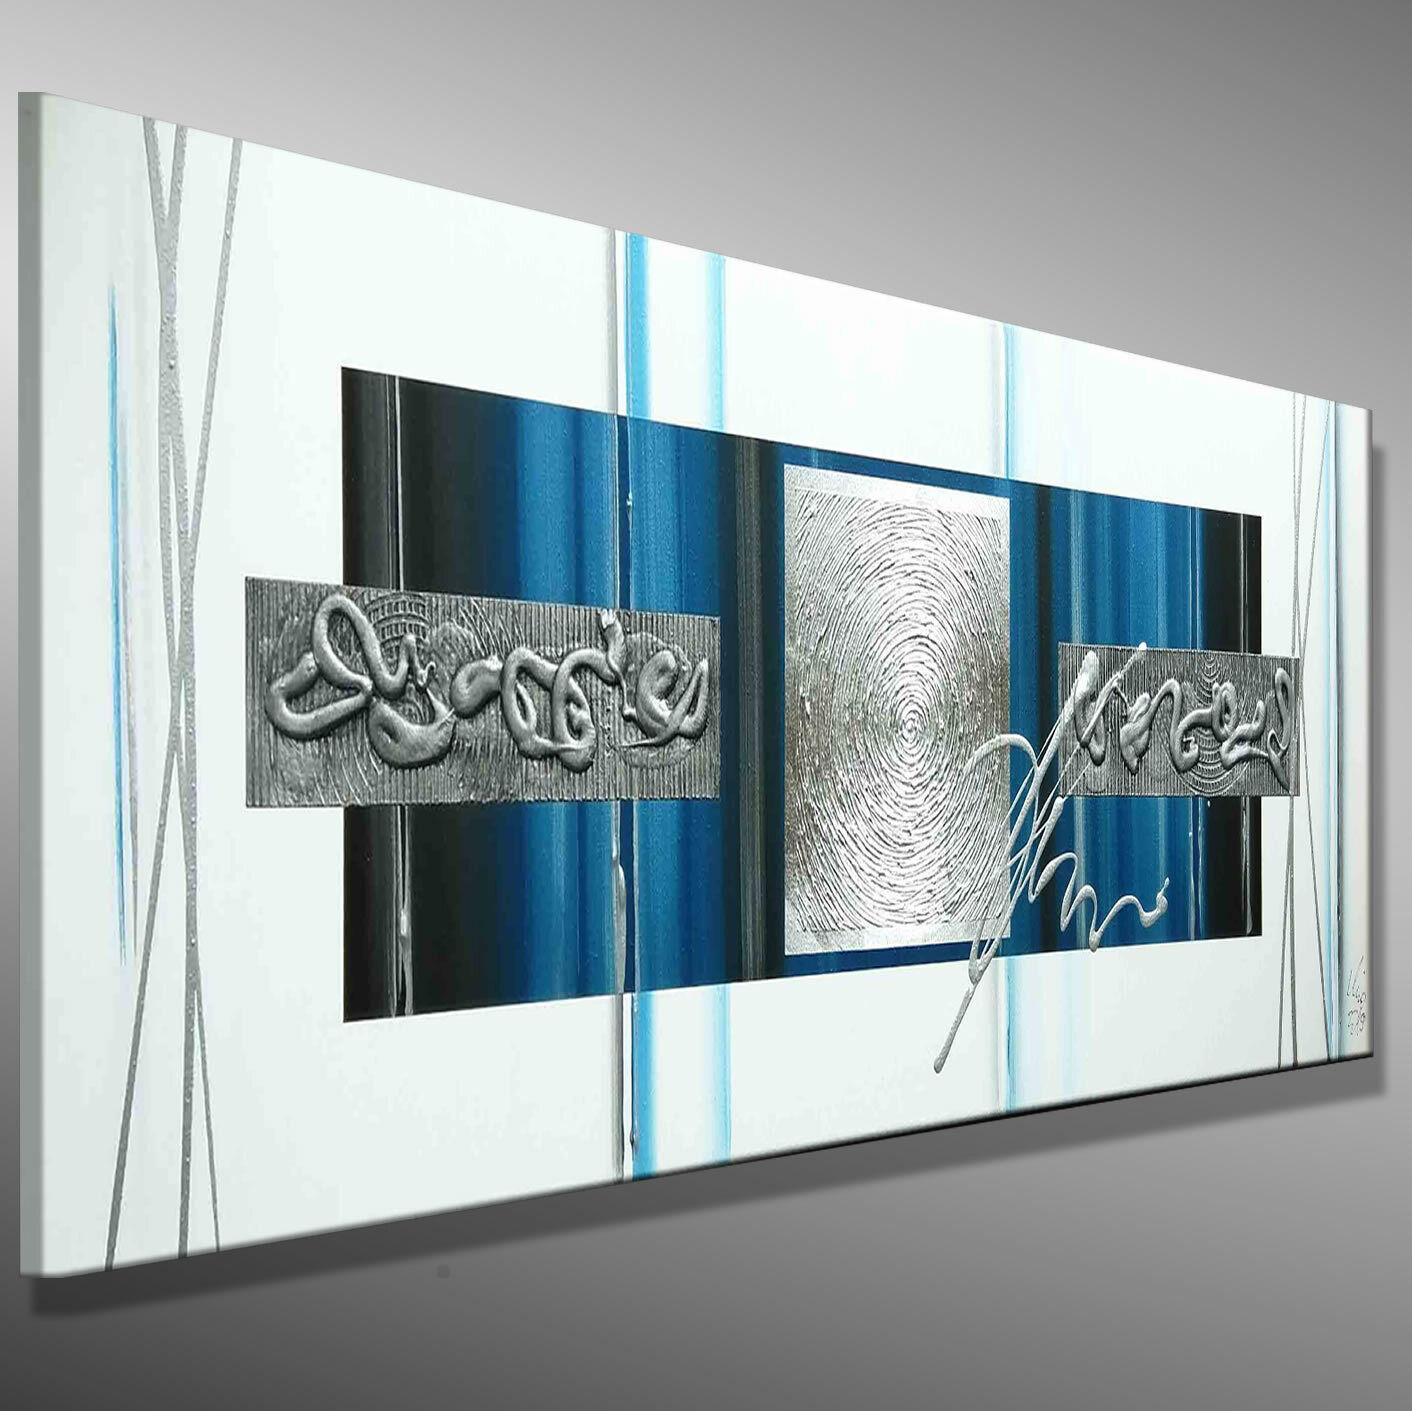 MODERNE KUNST Acrylbild MALEREI Leinwand Bilder original abstrakt  MICO - 120x40